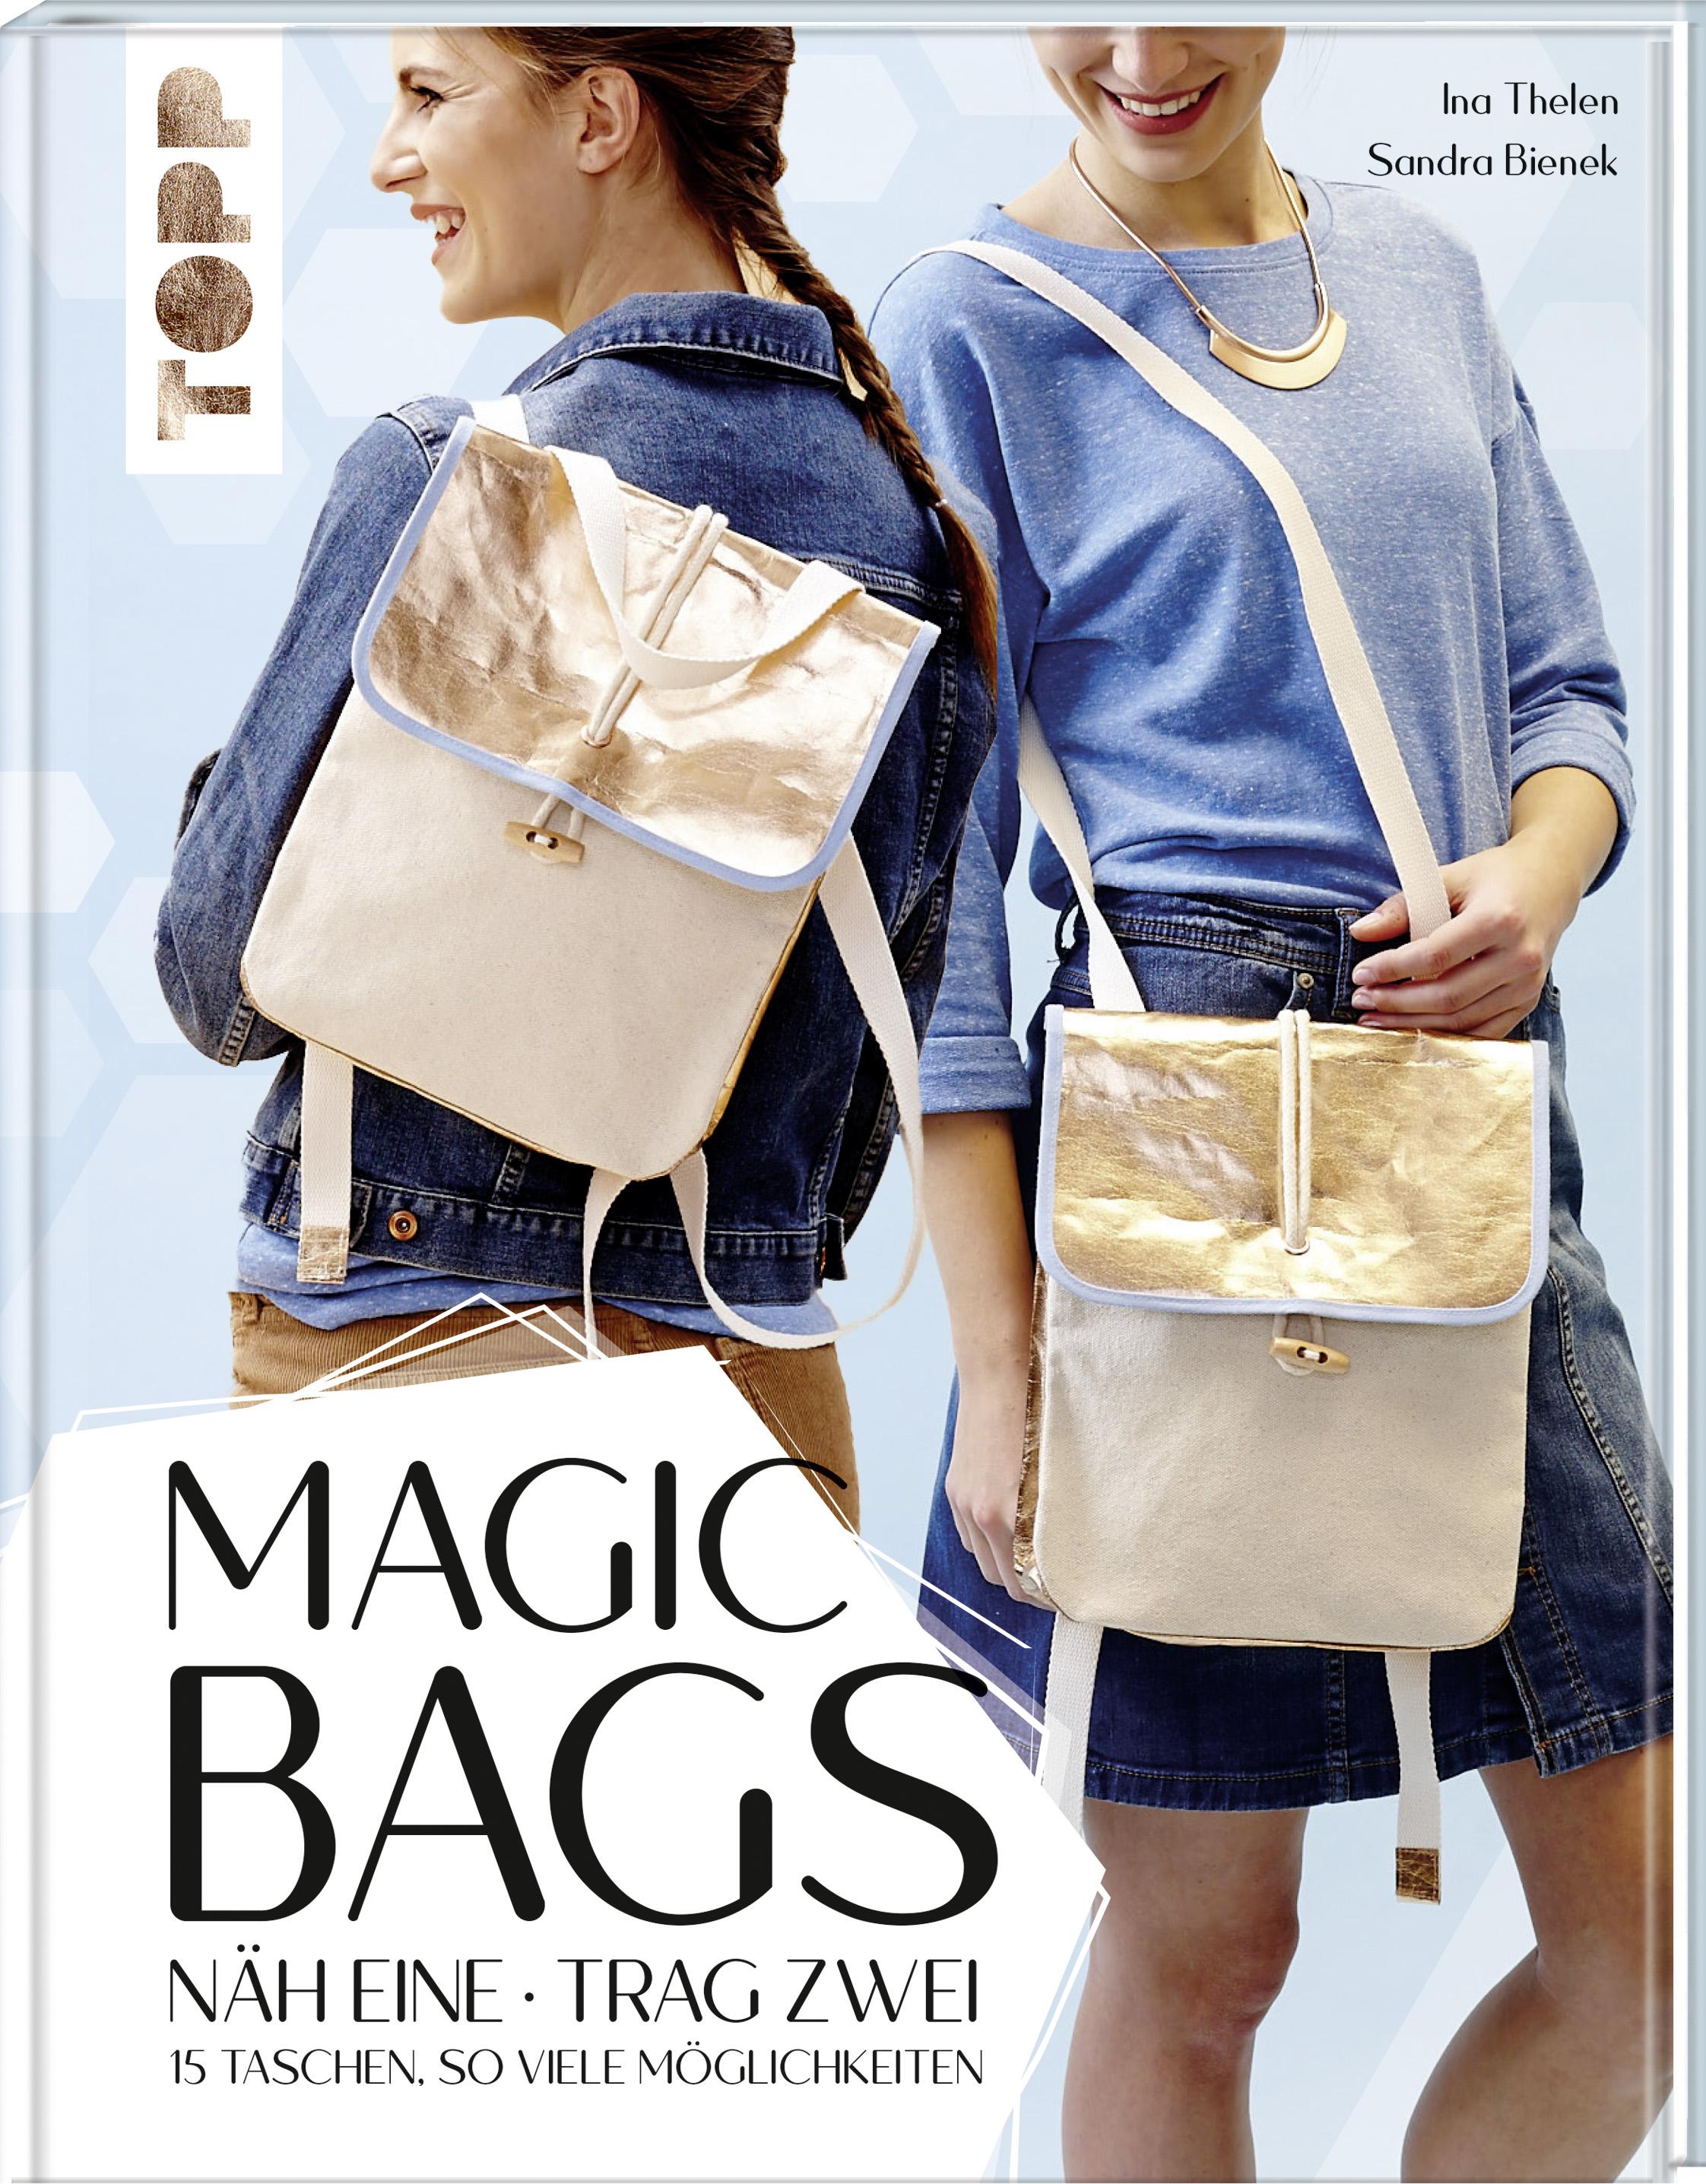 Magic-Bags-Naeh-eine-trag-zwei-Ina-Thelen